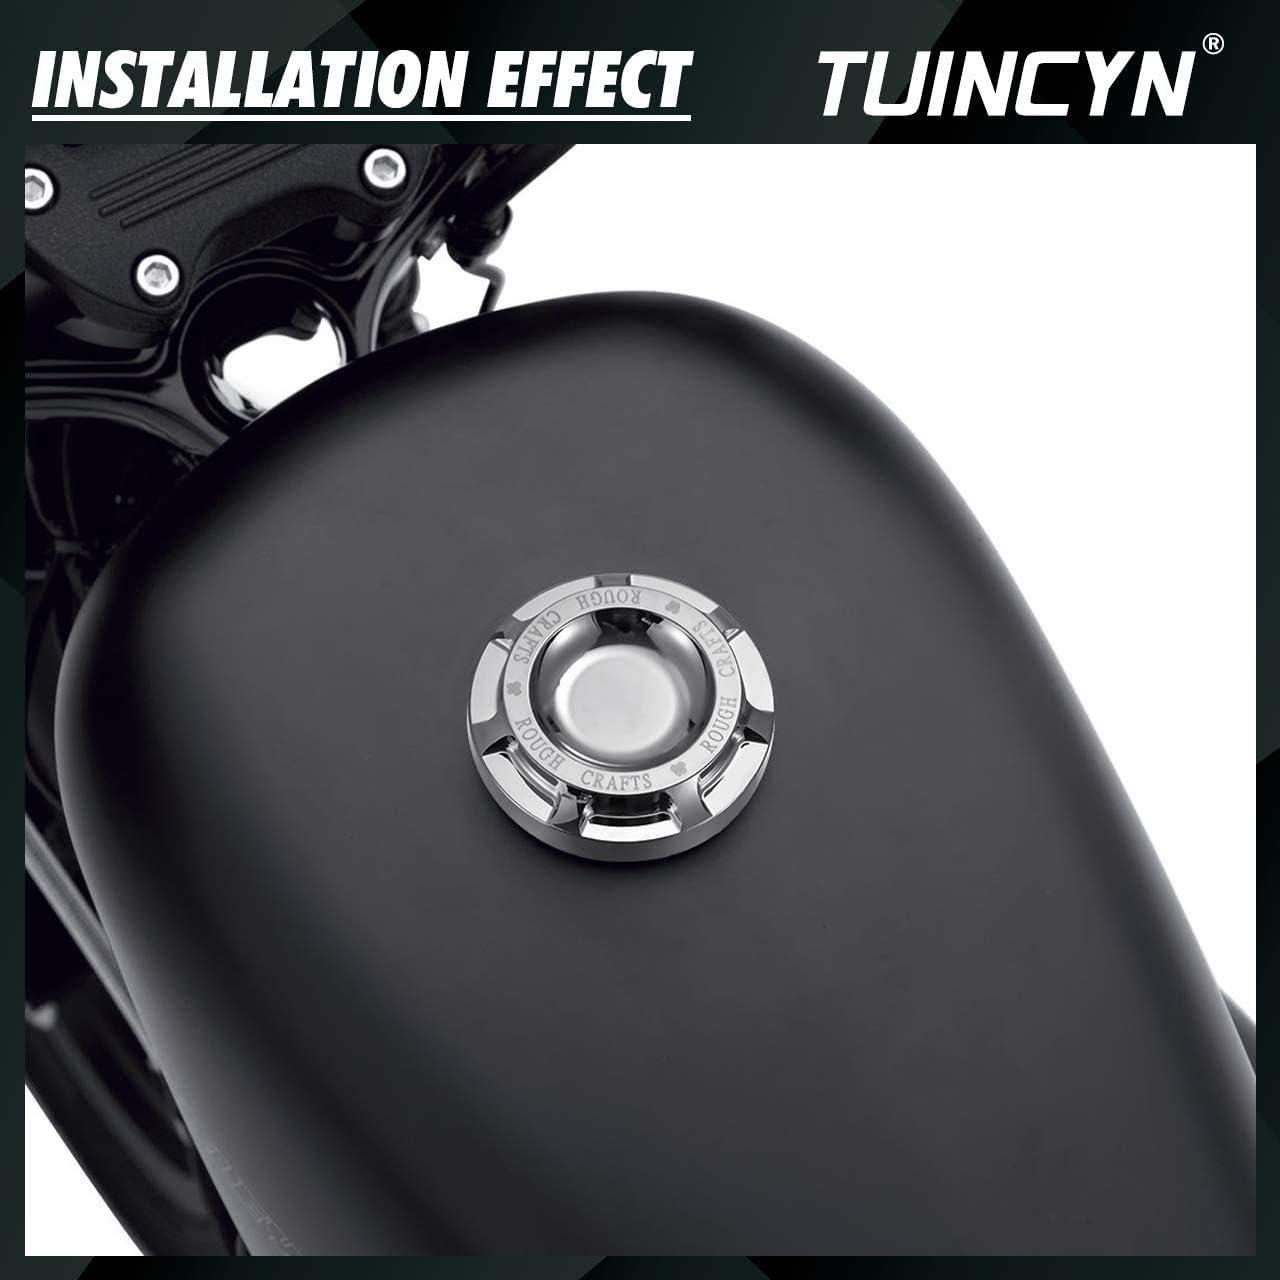 Motorcycle Silver CNC Fuel Gas Oil Cap Rough Crafts Flush Mount Billet Aluminum Fuel Tank Cap for Harley Sportster XL 1200 883 1996-2014